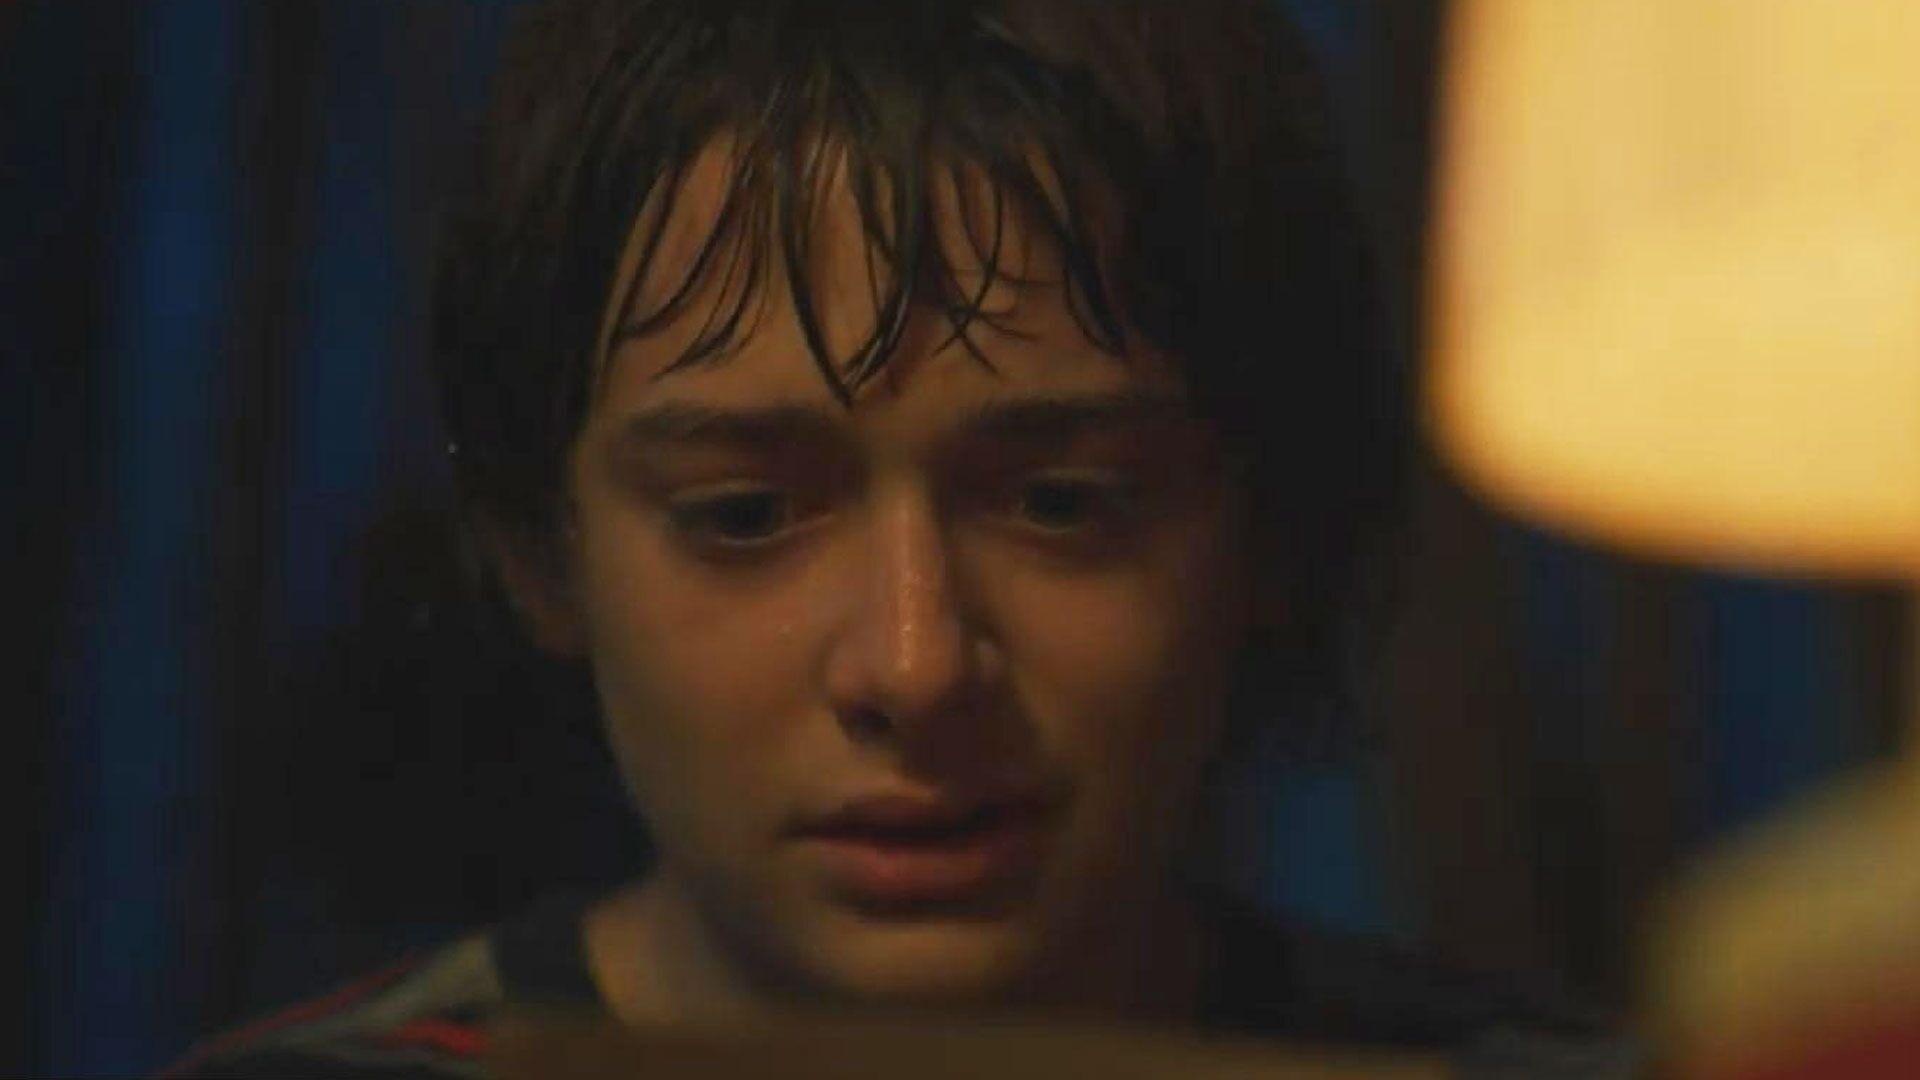 Stranger Things' Season 3 Breaks Major Netflix Record in